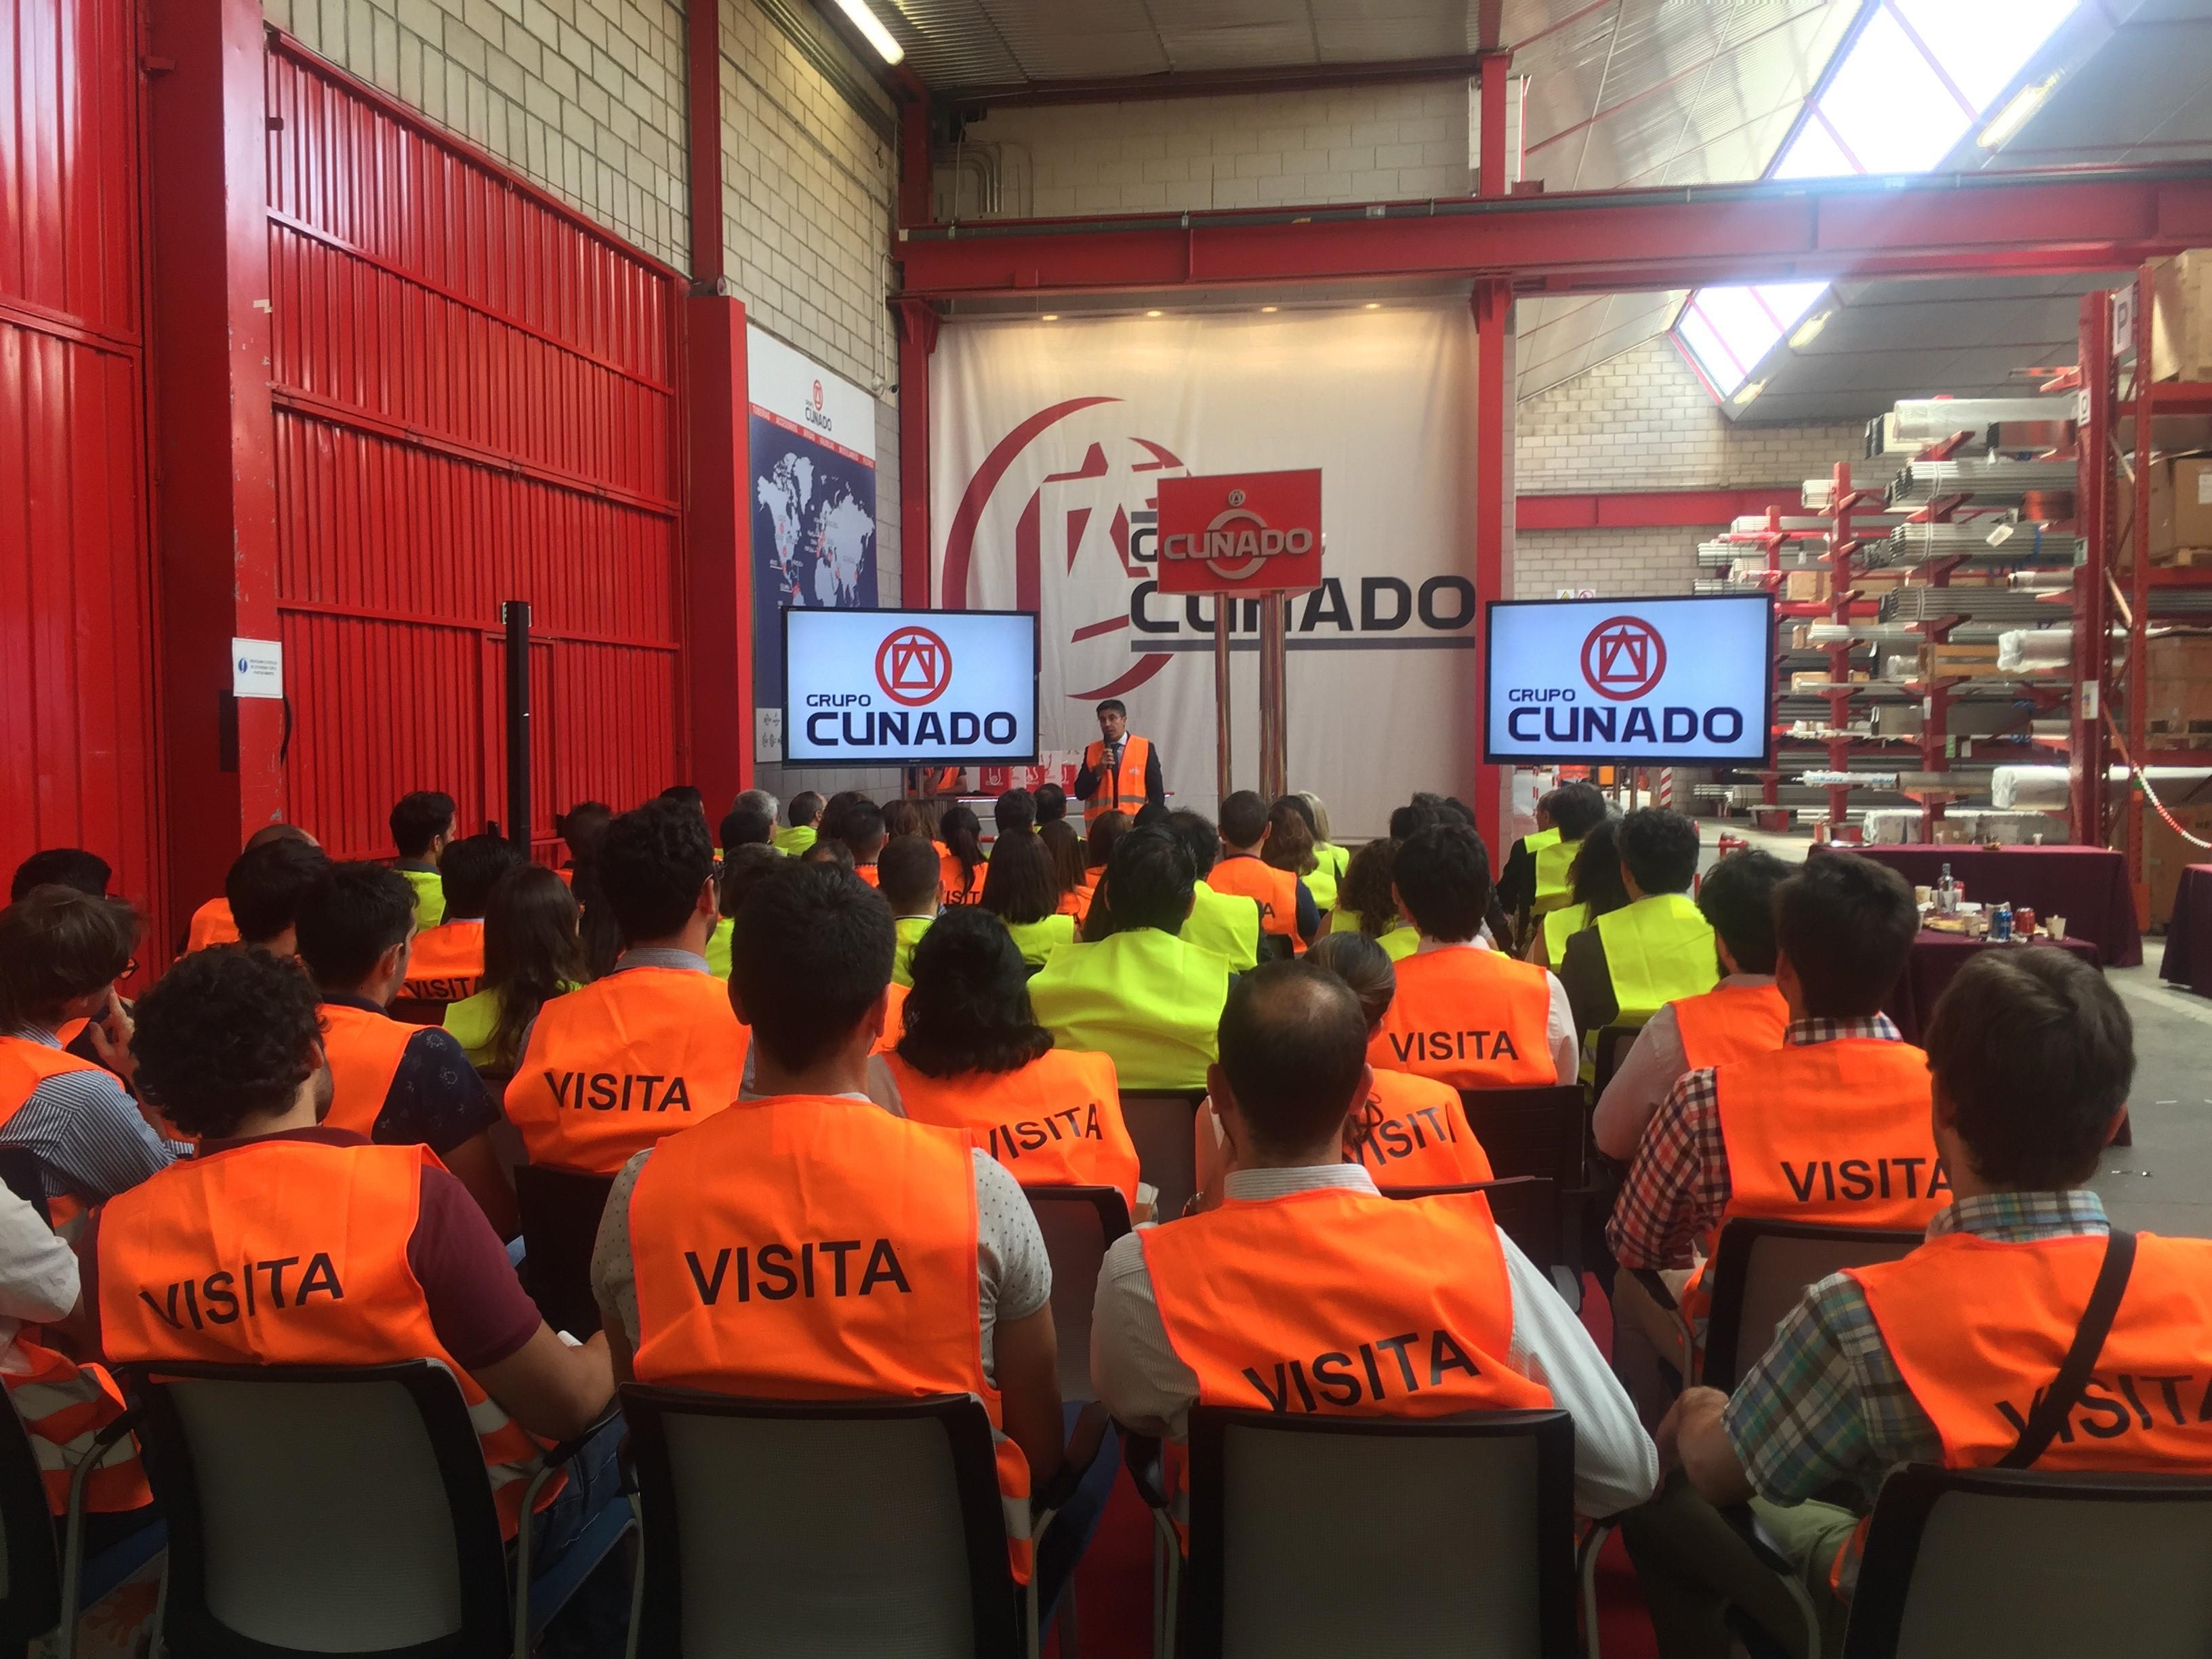 Técnicas Reunidas visits Grupo Cuñado